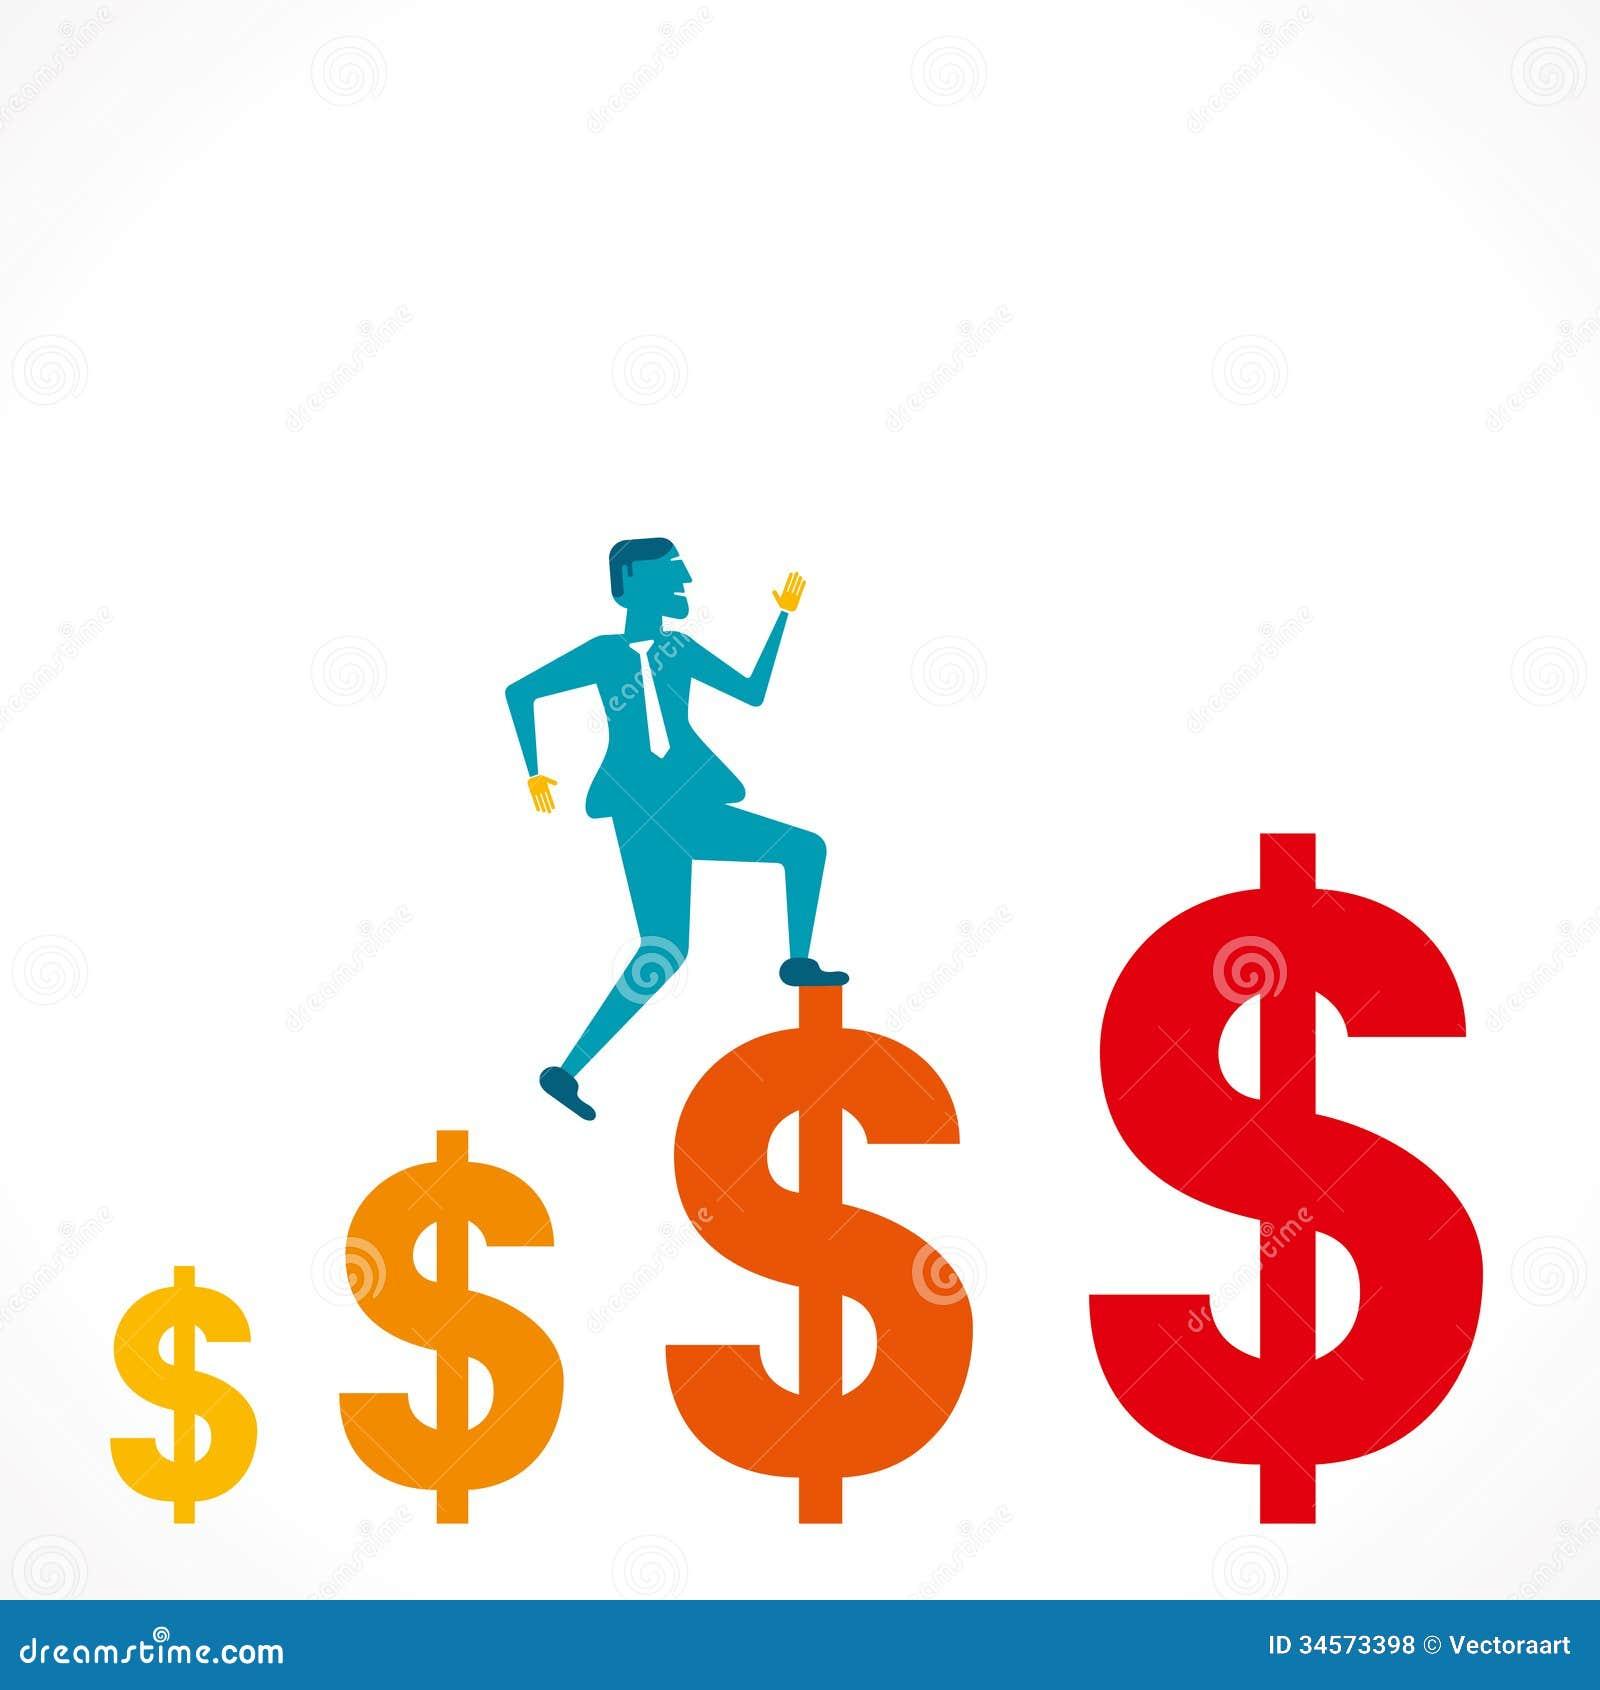 Profit Graph Royalty Free Stock Photos - Image: 34573398